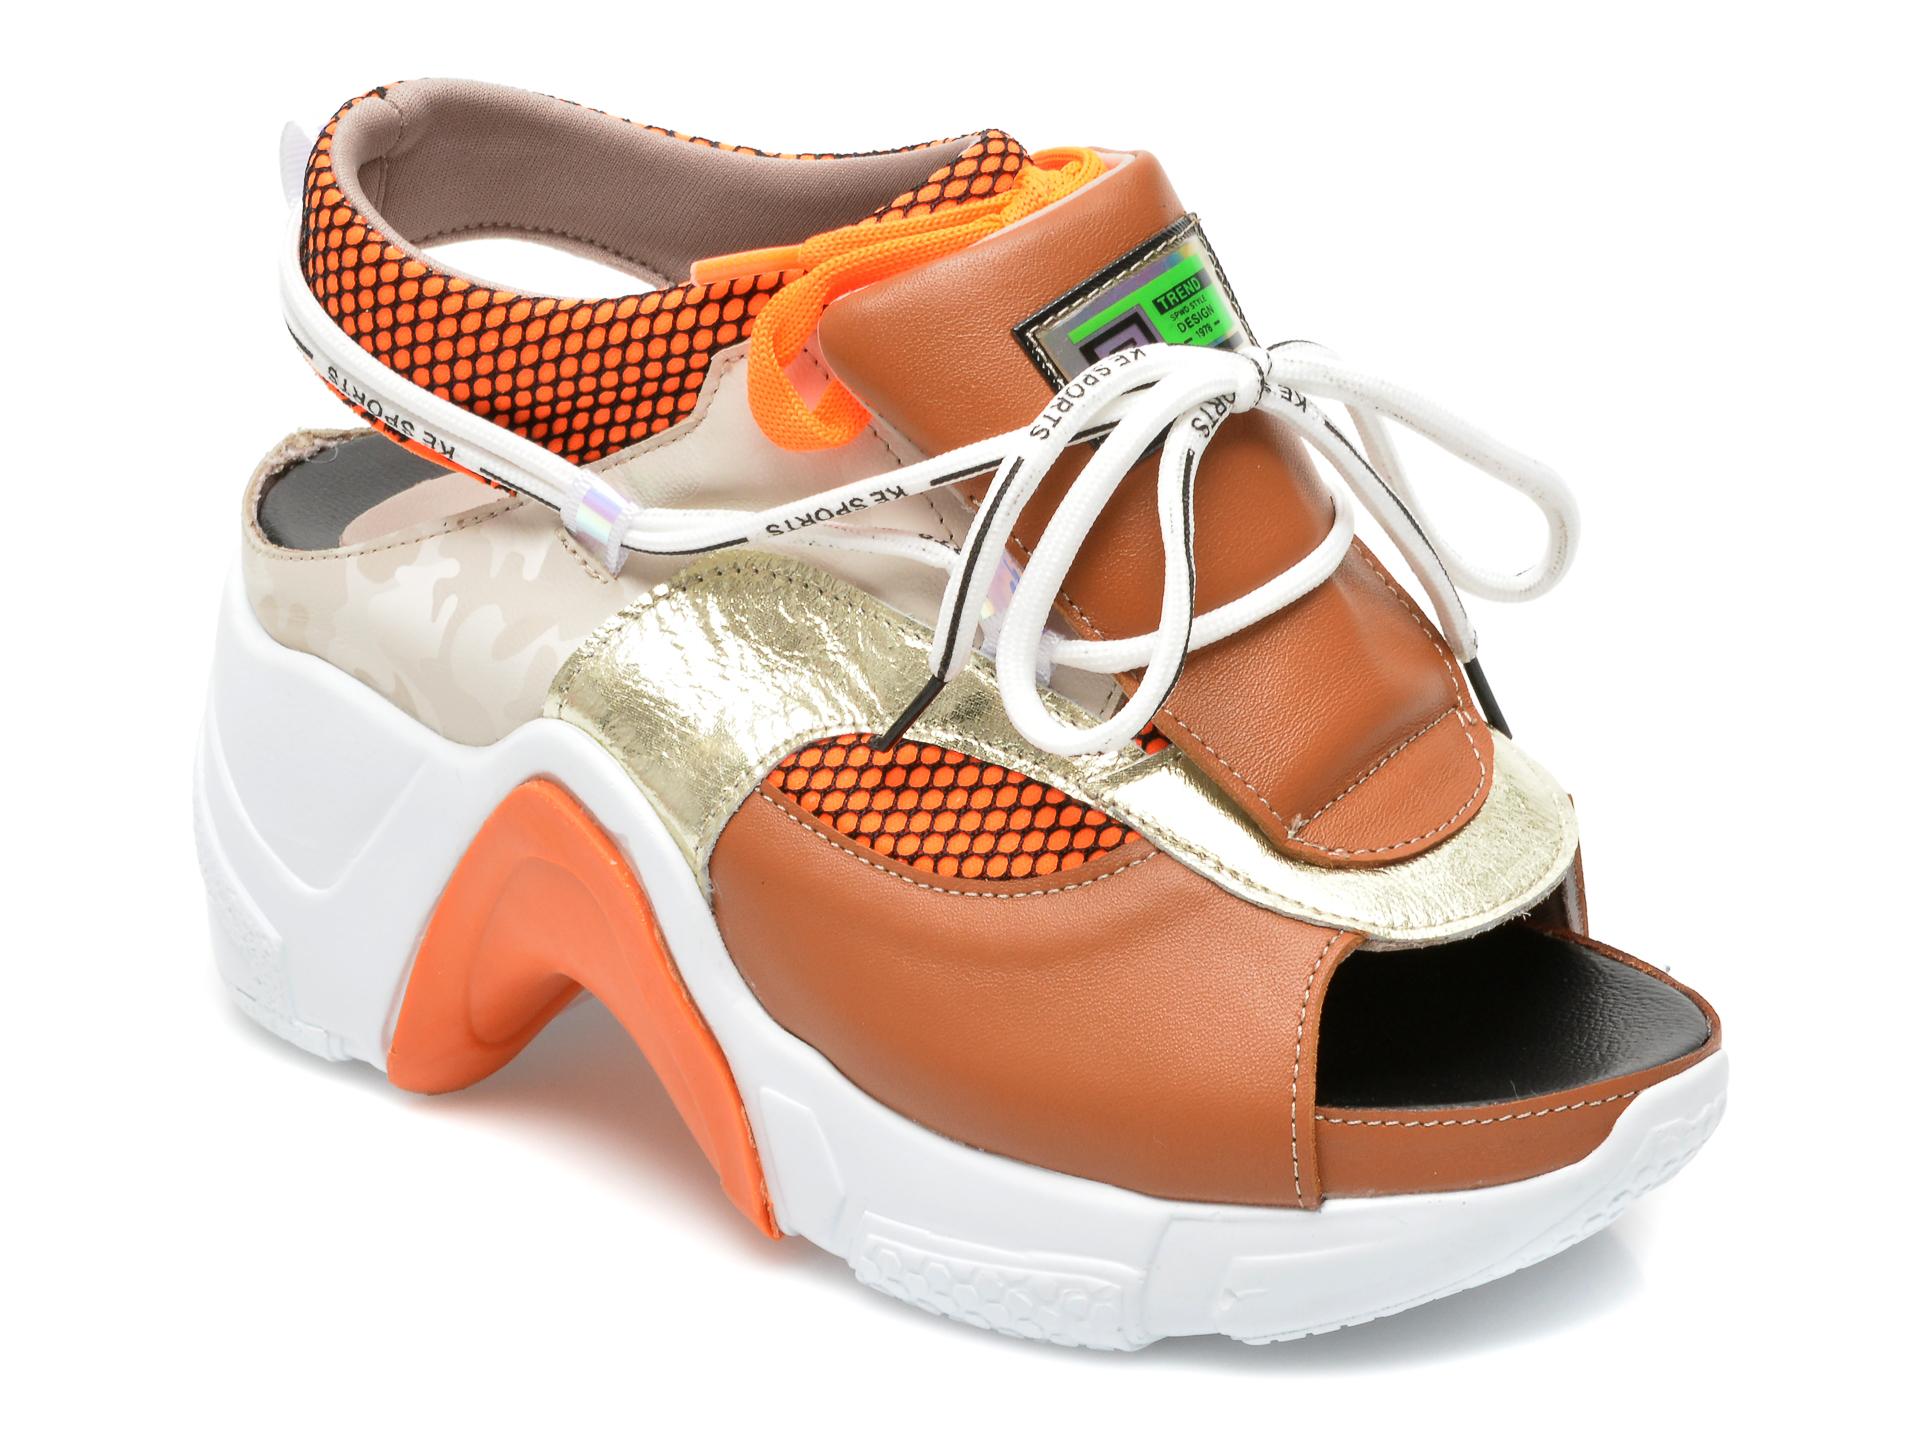 Sandale GRYXX portocalii, 4403075, din material textil si piele naturala imagine 2021 Gryxx